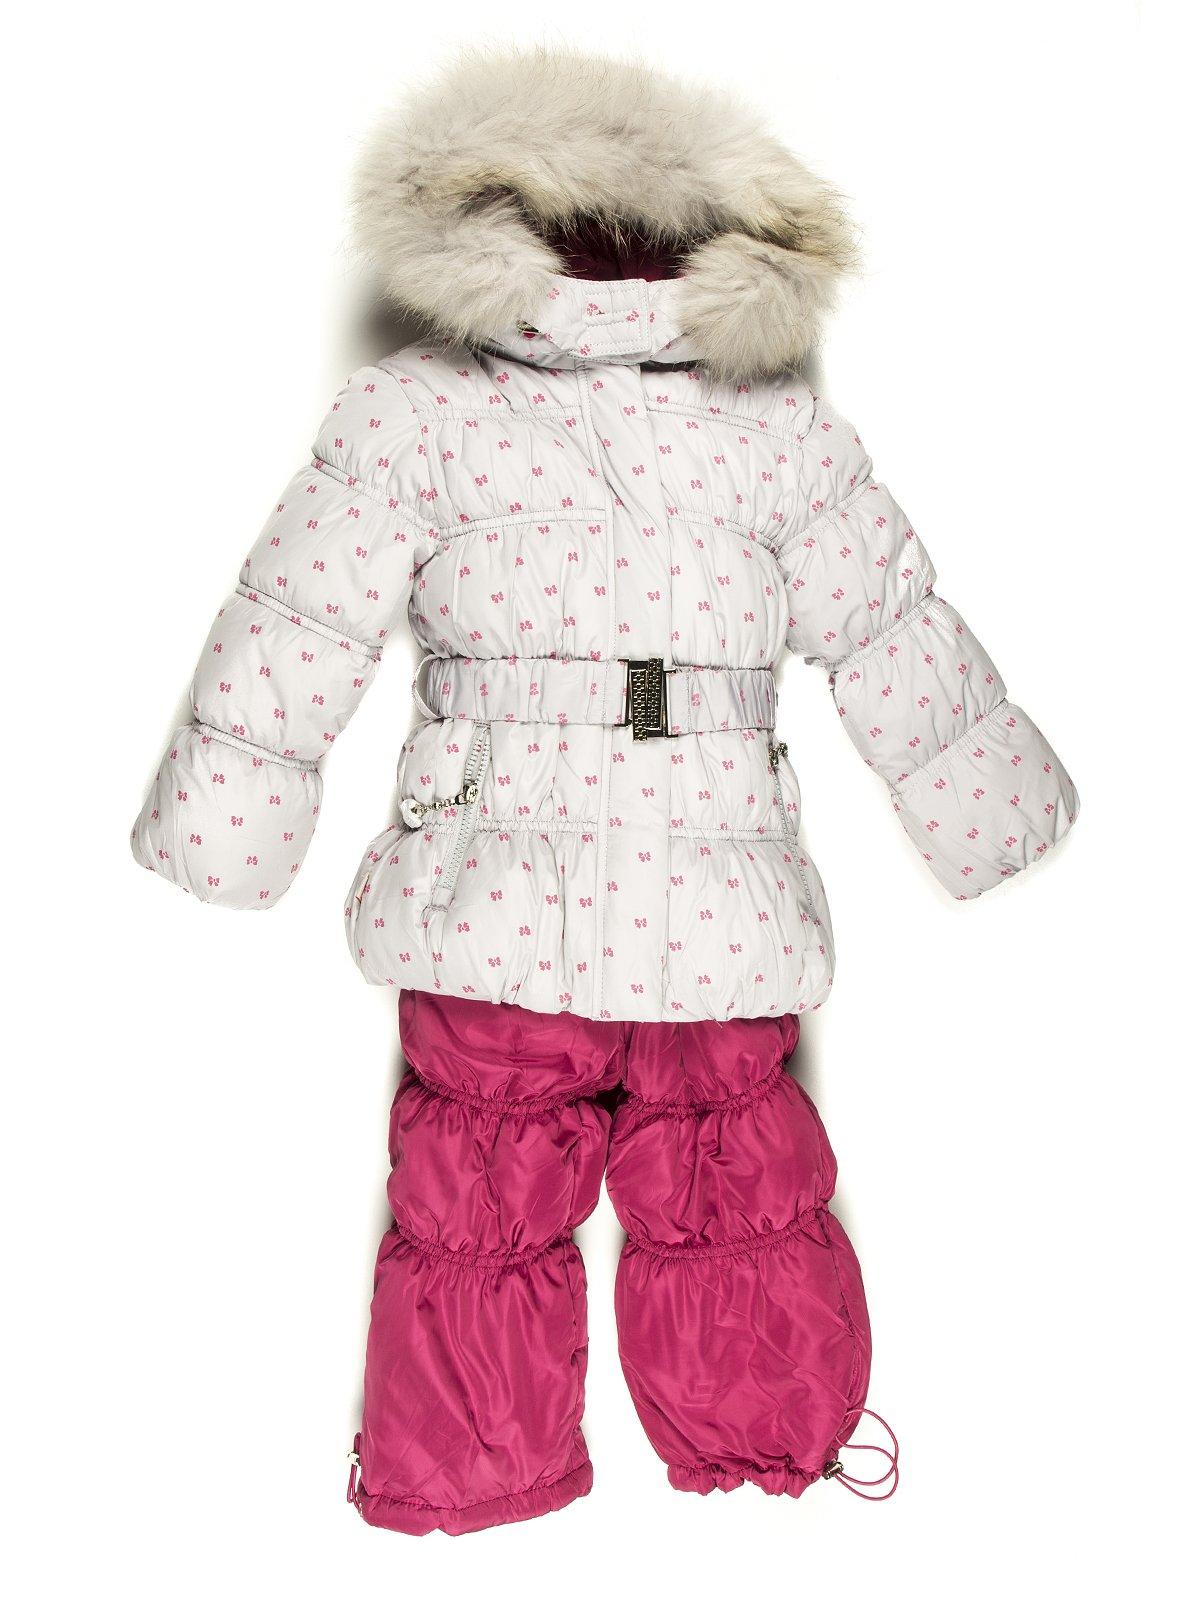 Комплект: куртка и полукомбинезон | 677981